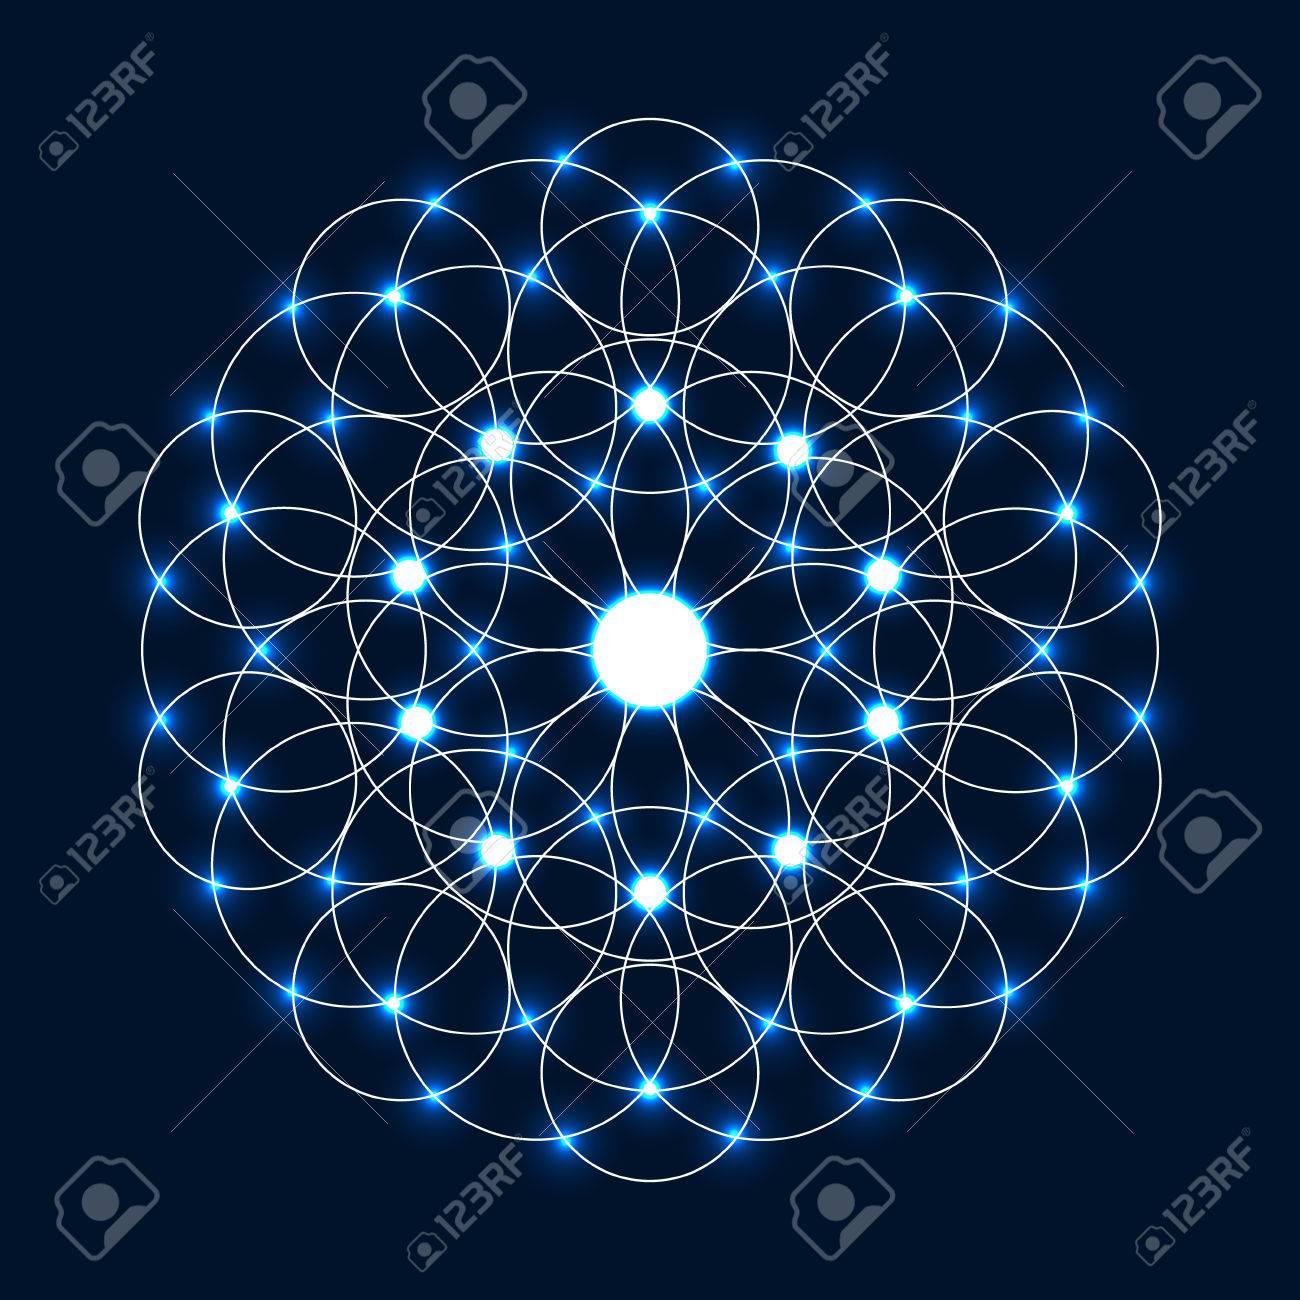 Círculo Abstracto Geométrico Mandala Luz Geometrysparkle Sagrada